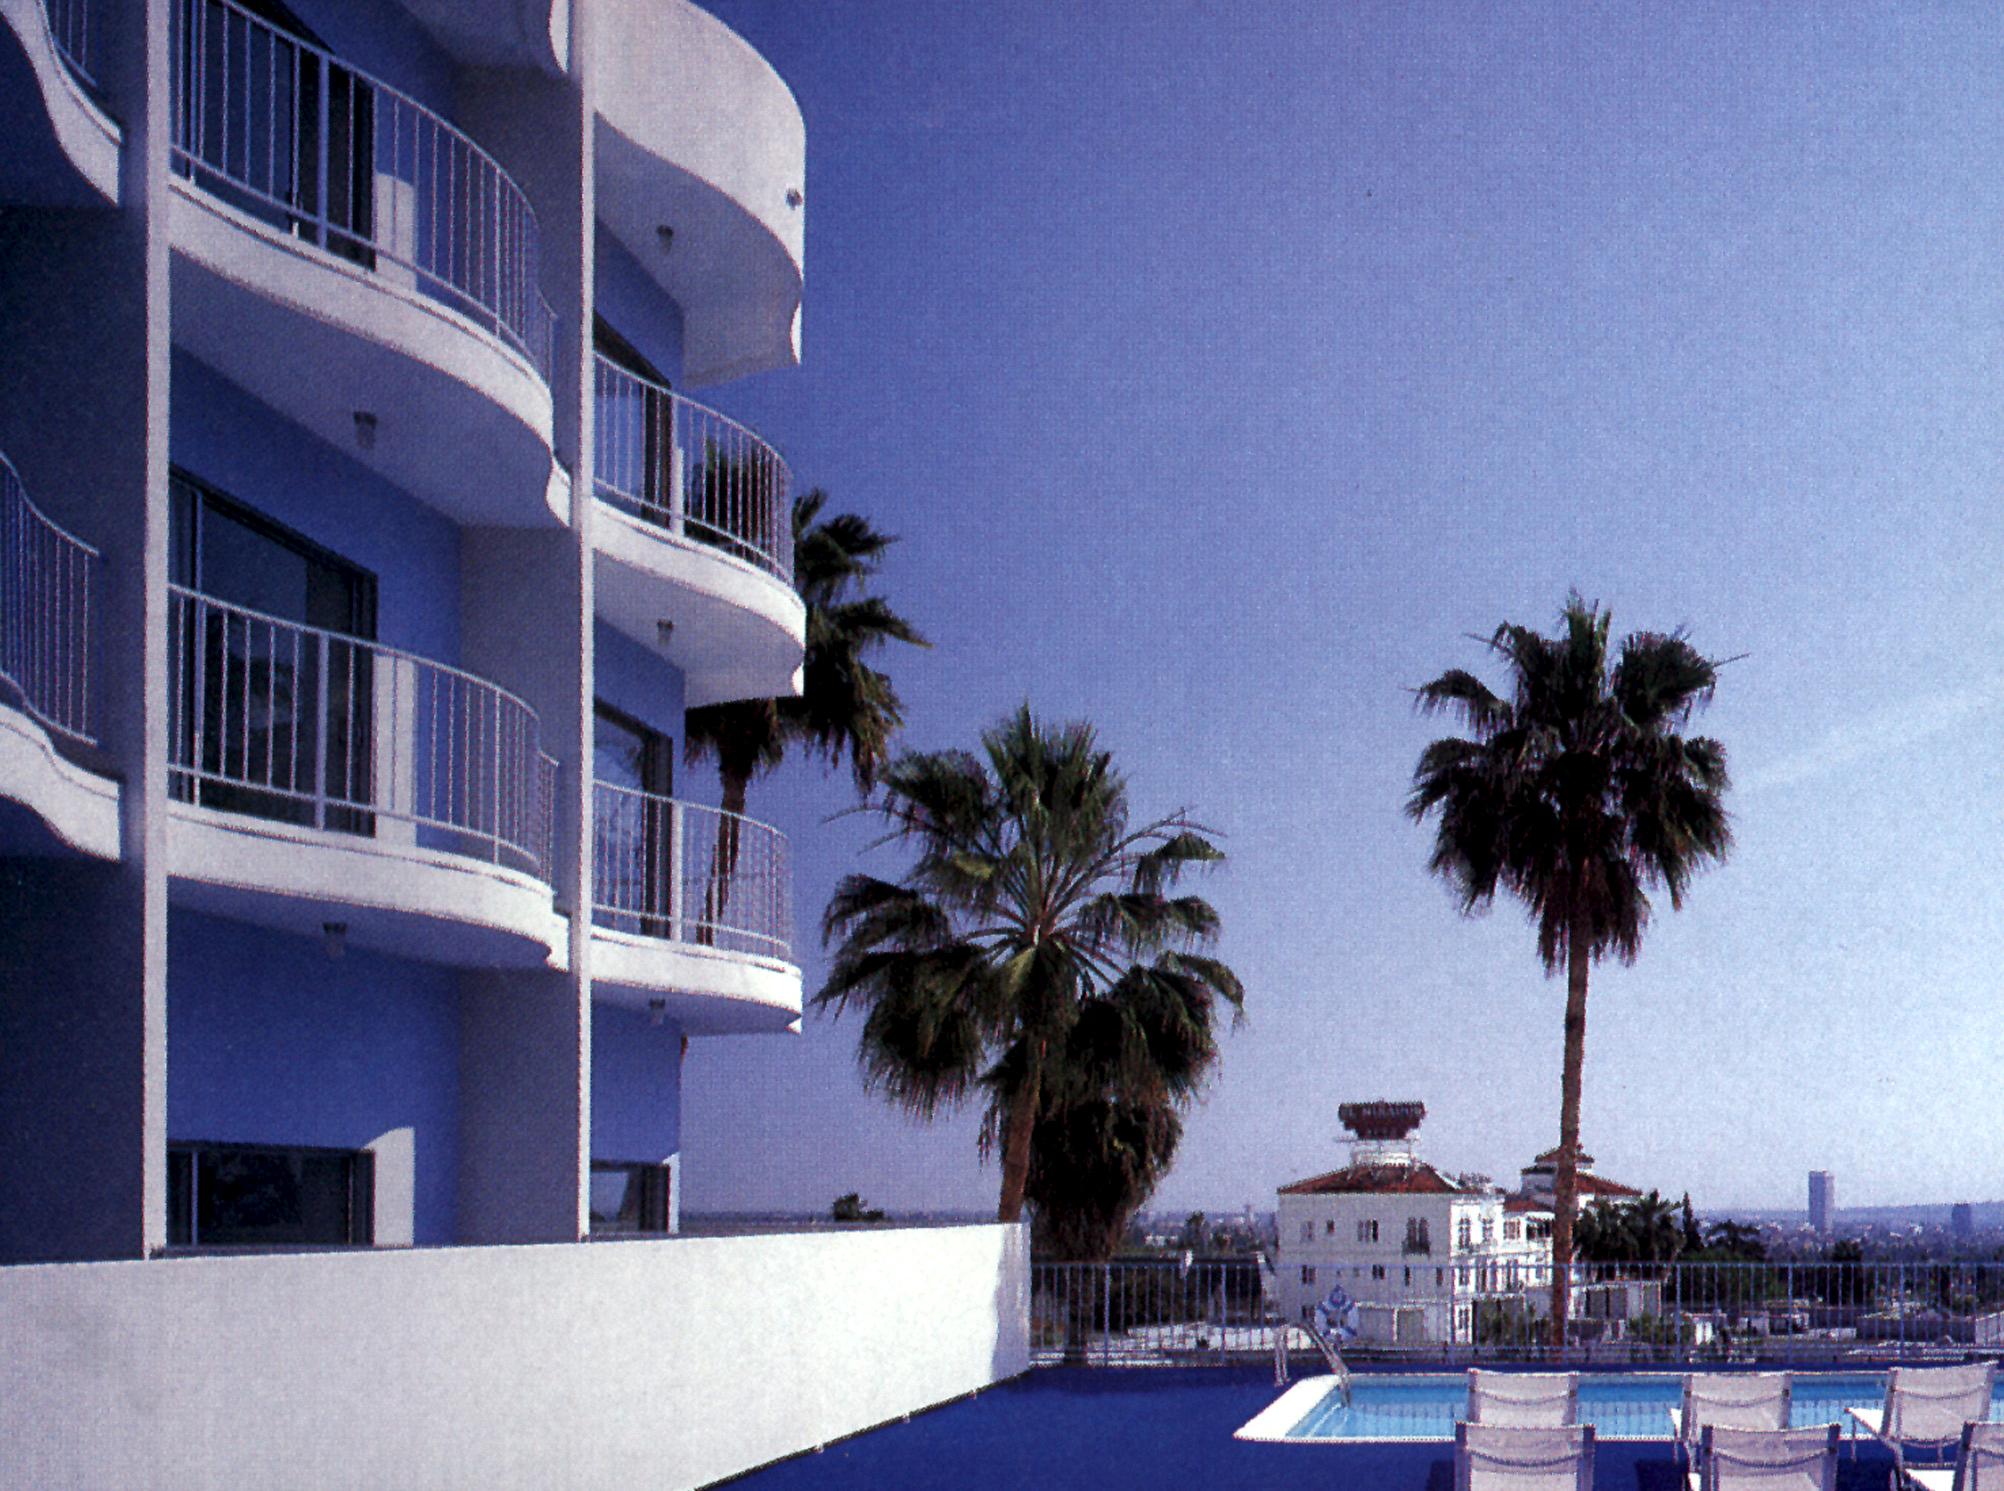 Standard Hotel, de Los Ángeles.